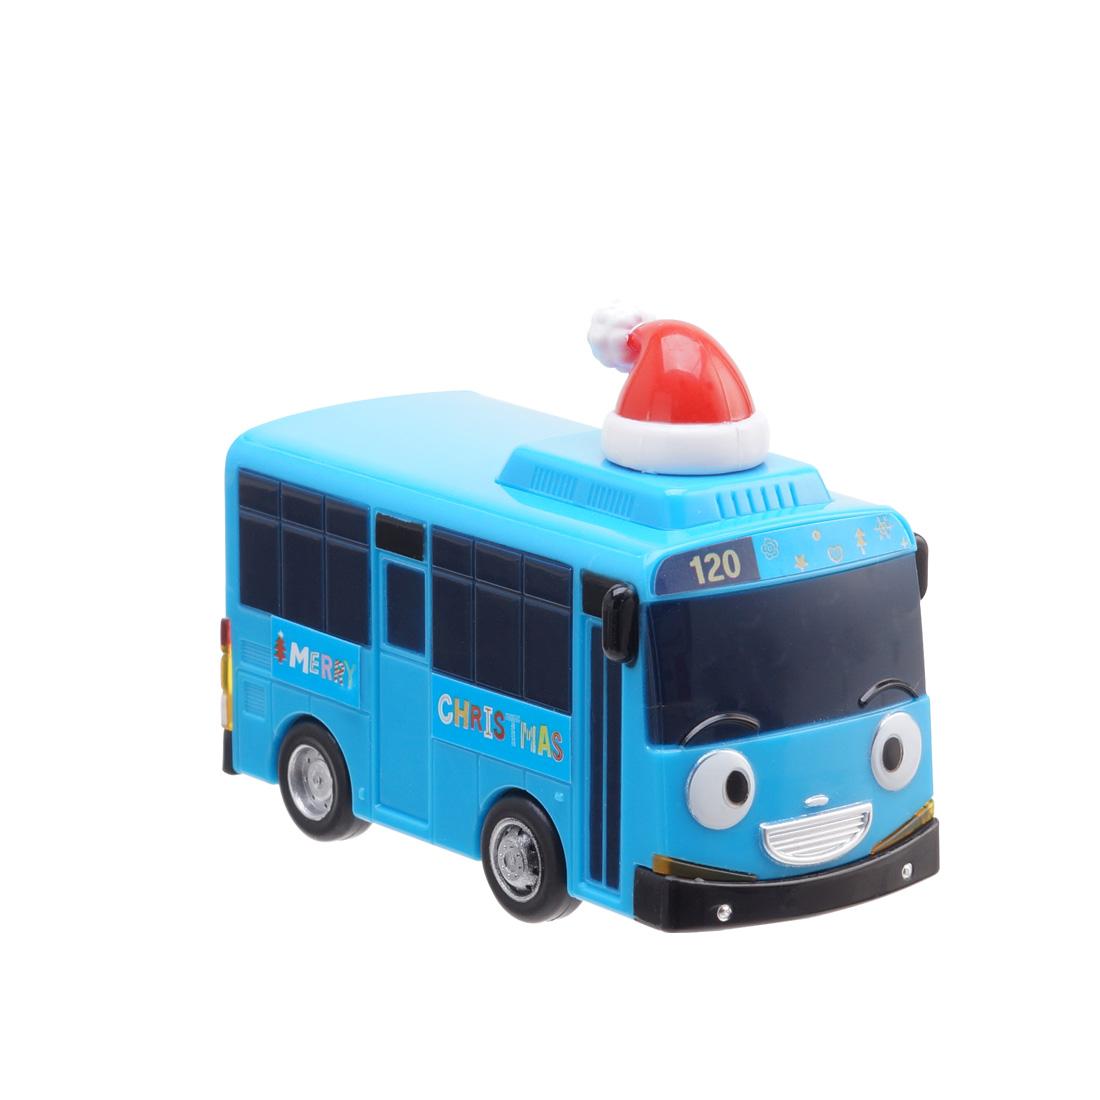 Тайо новогодний автобусы Тайо